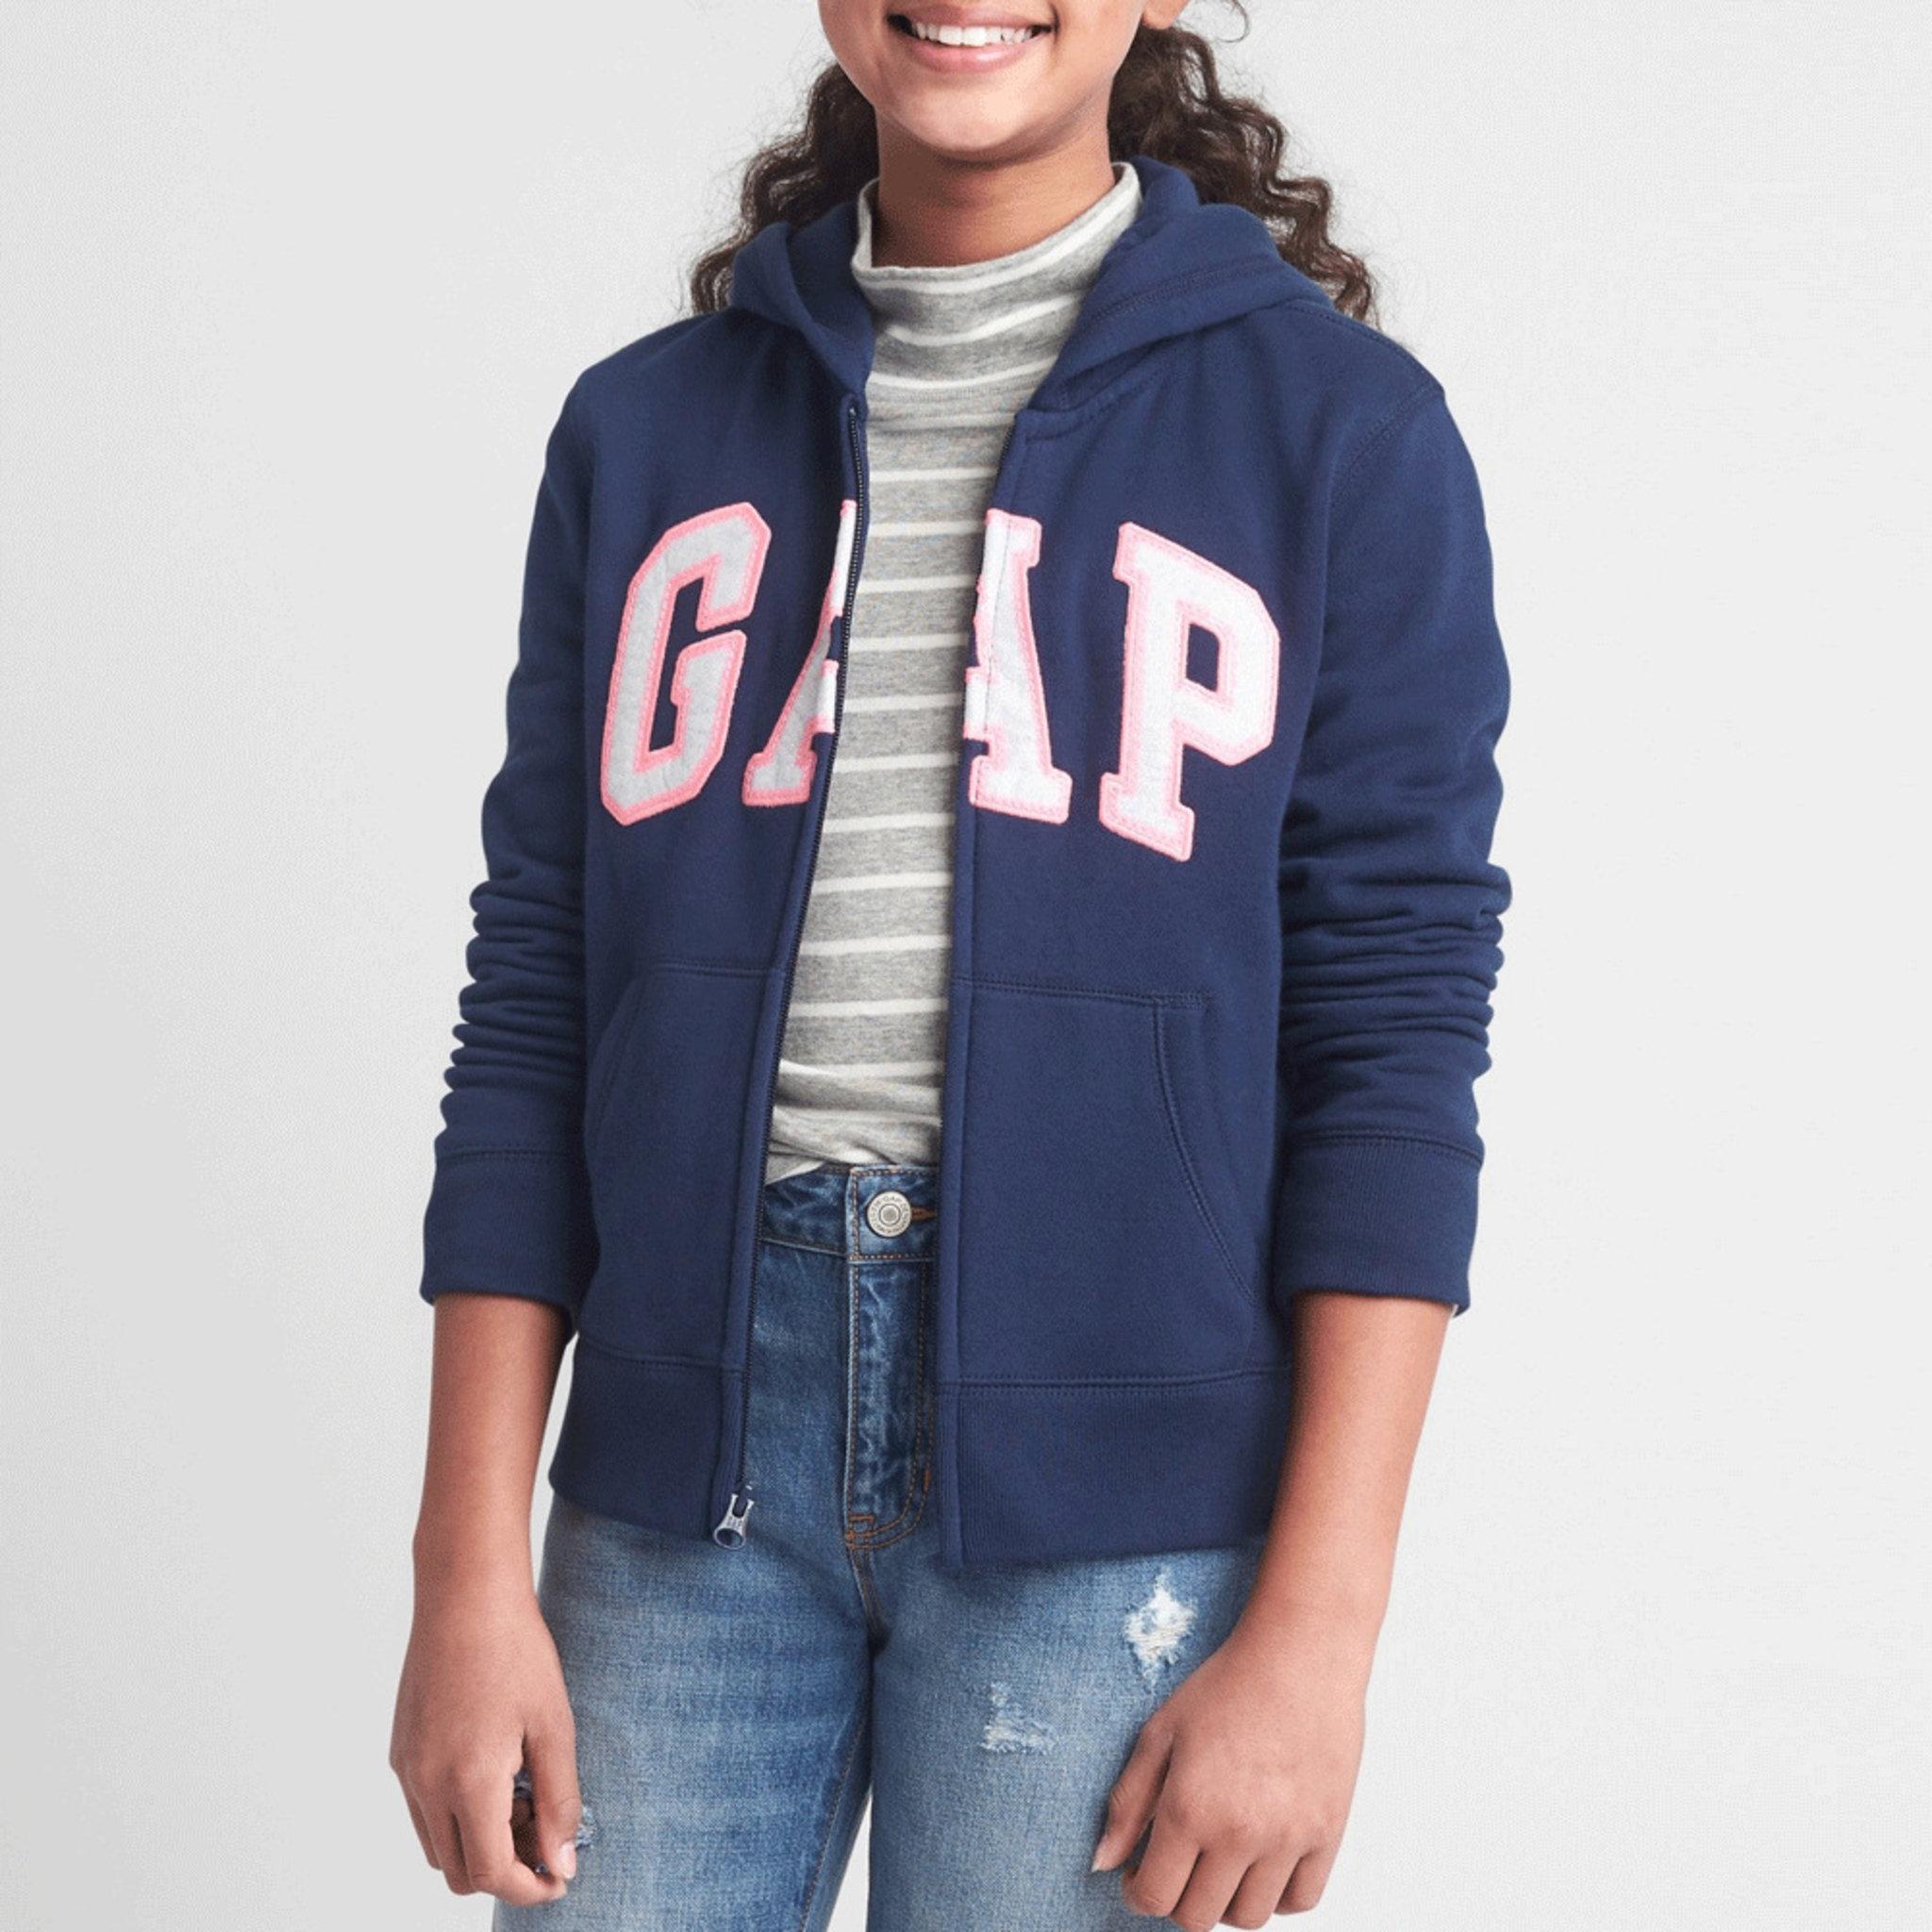 Hoodie med tryck - Tröjor   koftor - Köp online på åhlens.se! da9085f0d2f5b